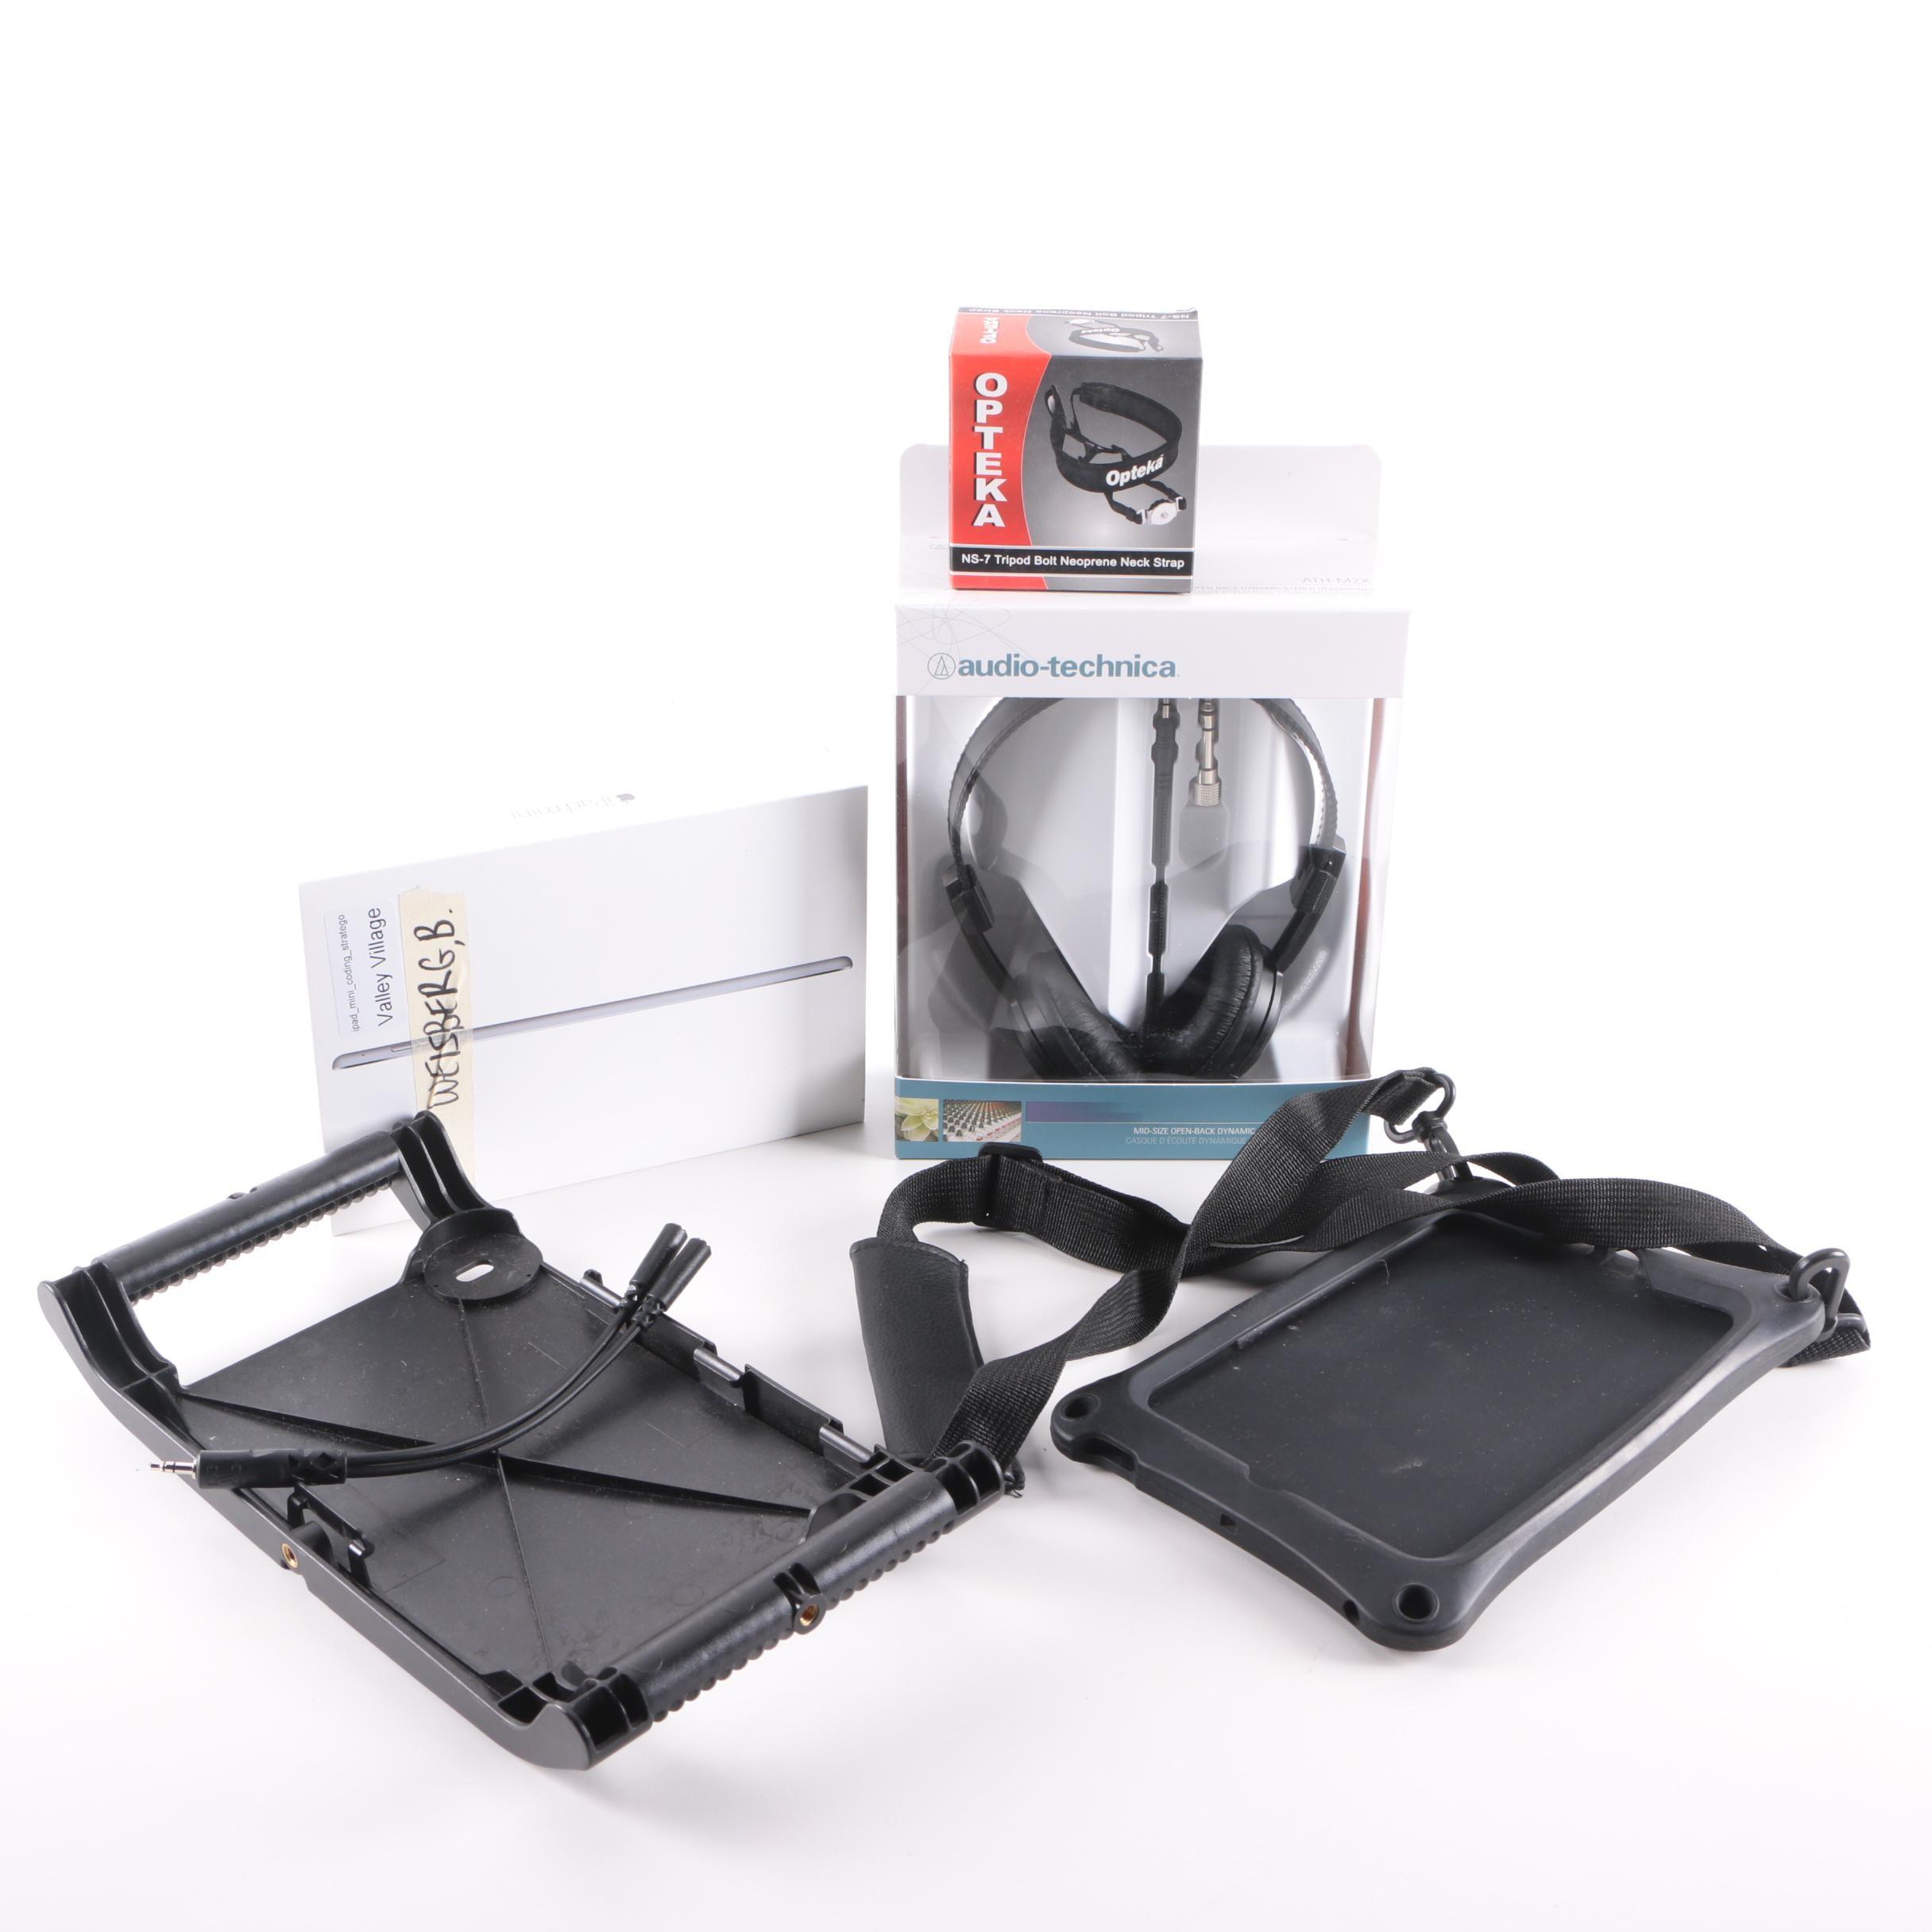 iPad Mini 4 with Accessories